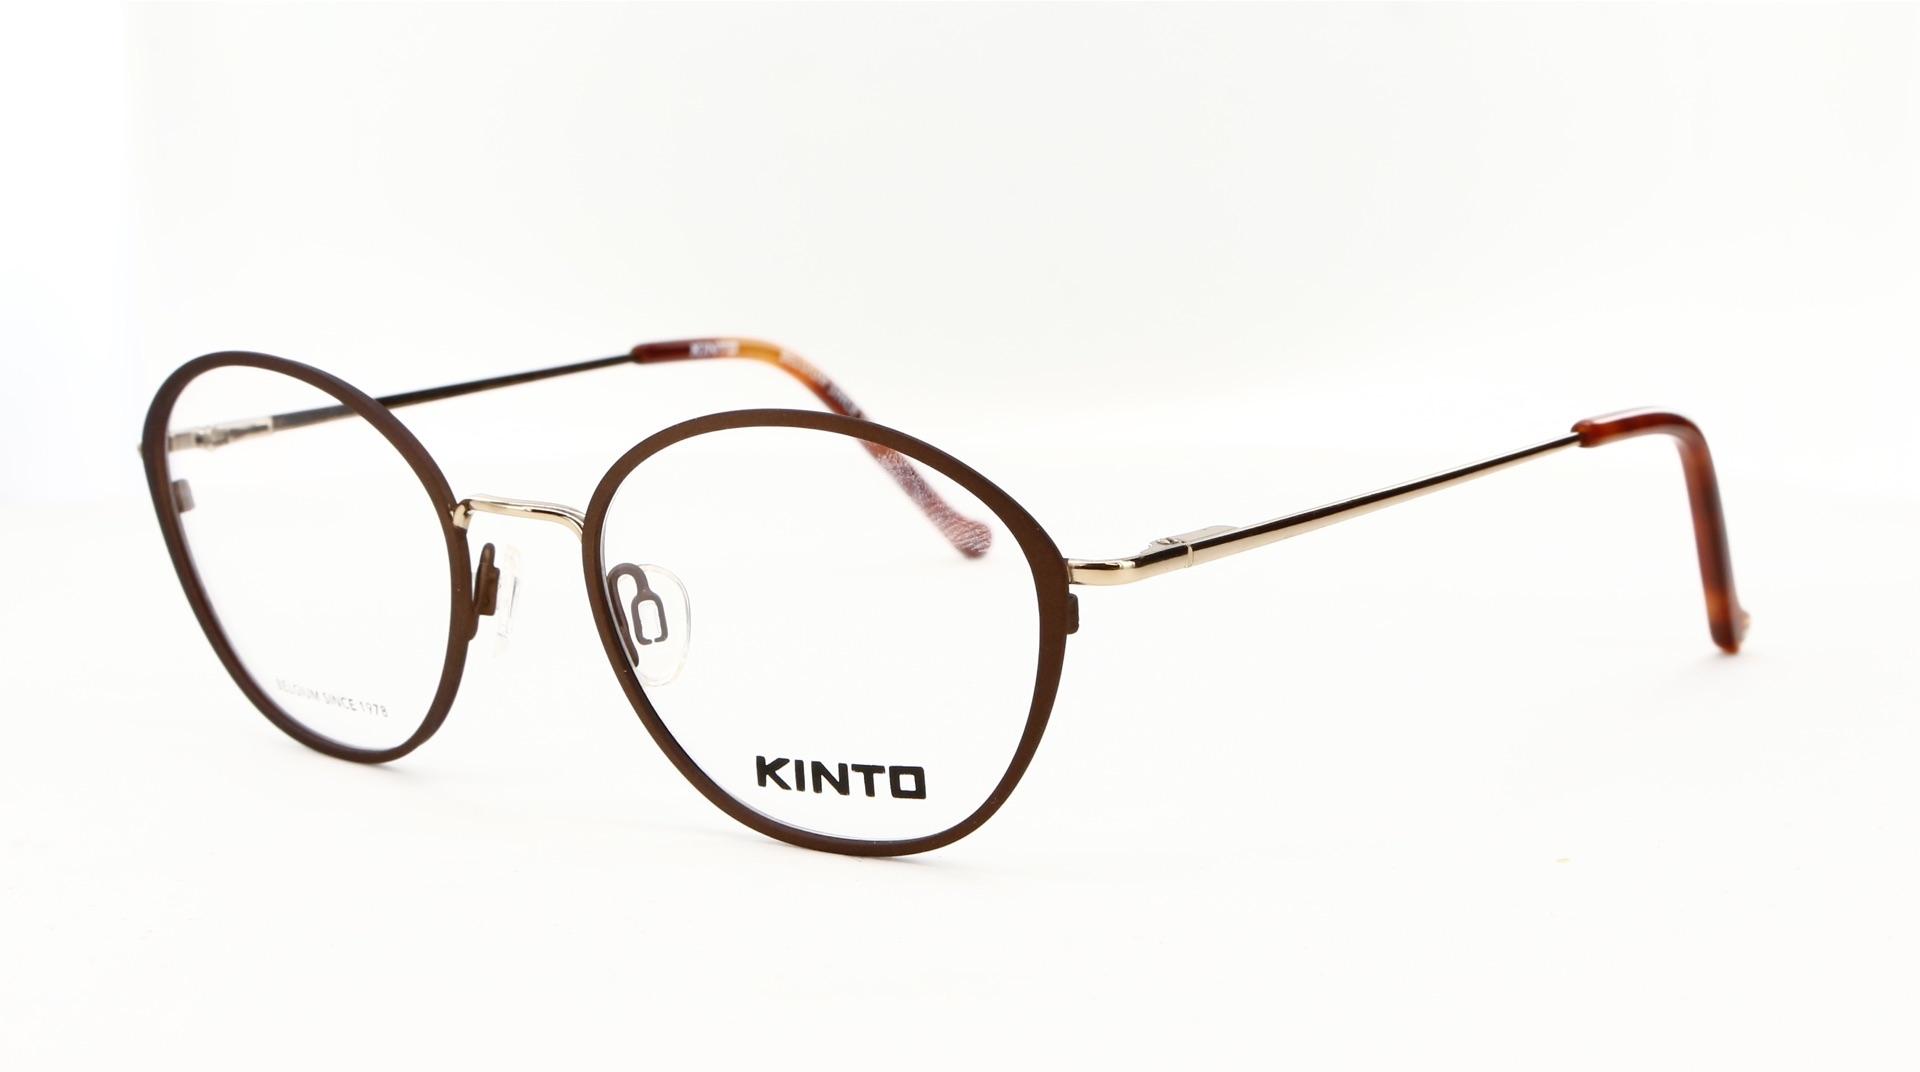 Kinto - ref: 80106